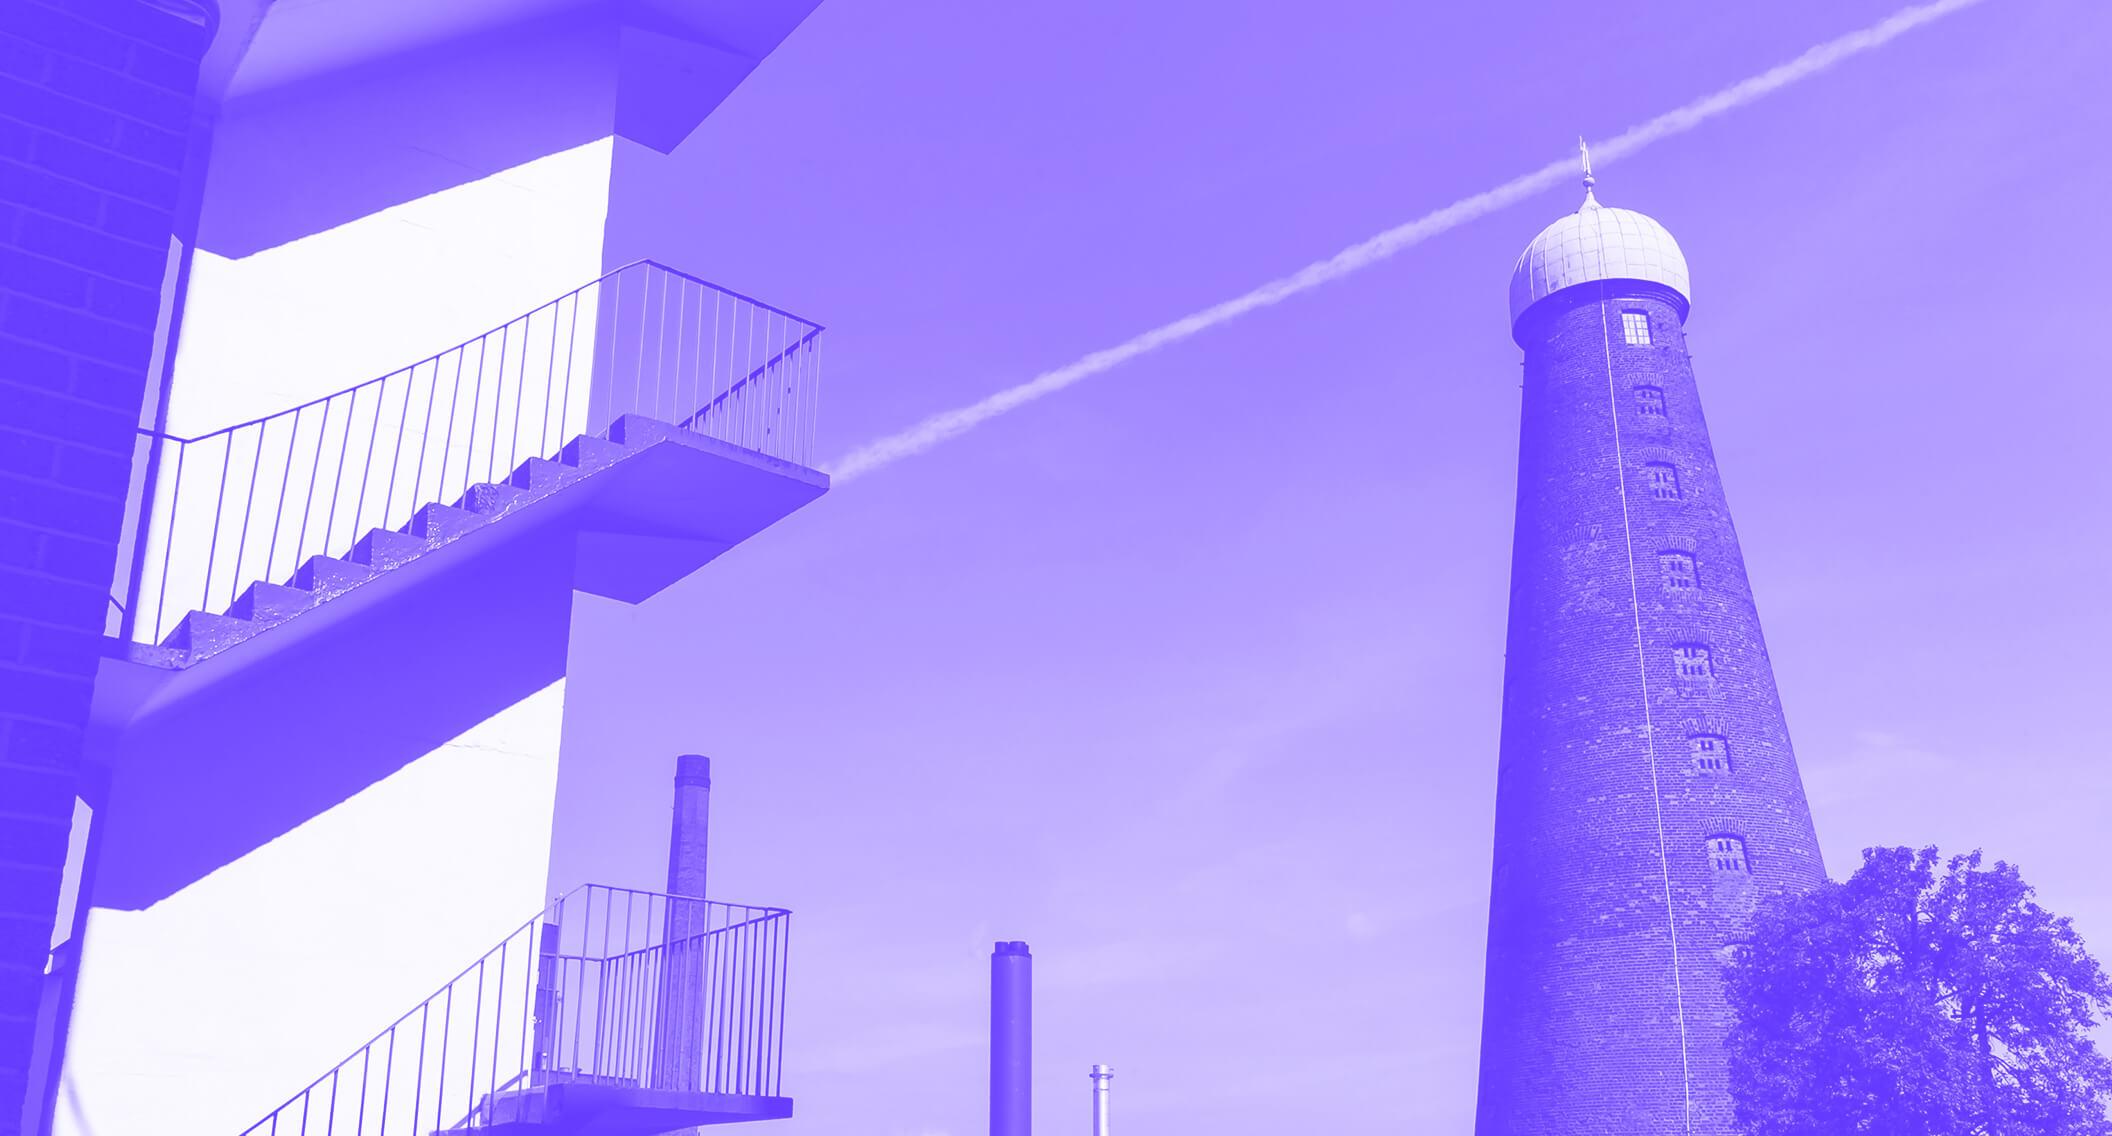 St. Patrick's Tower at The Digital Hub